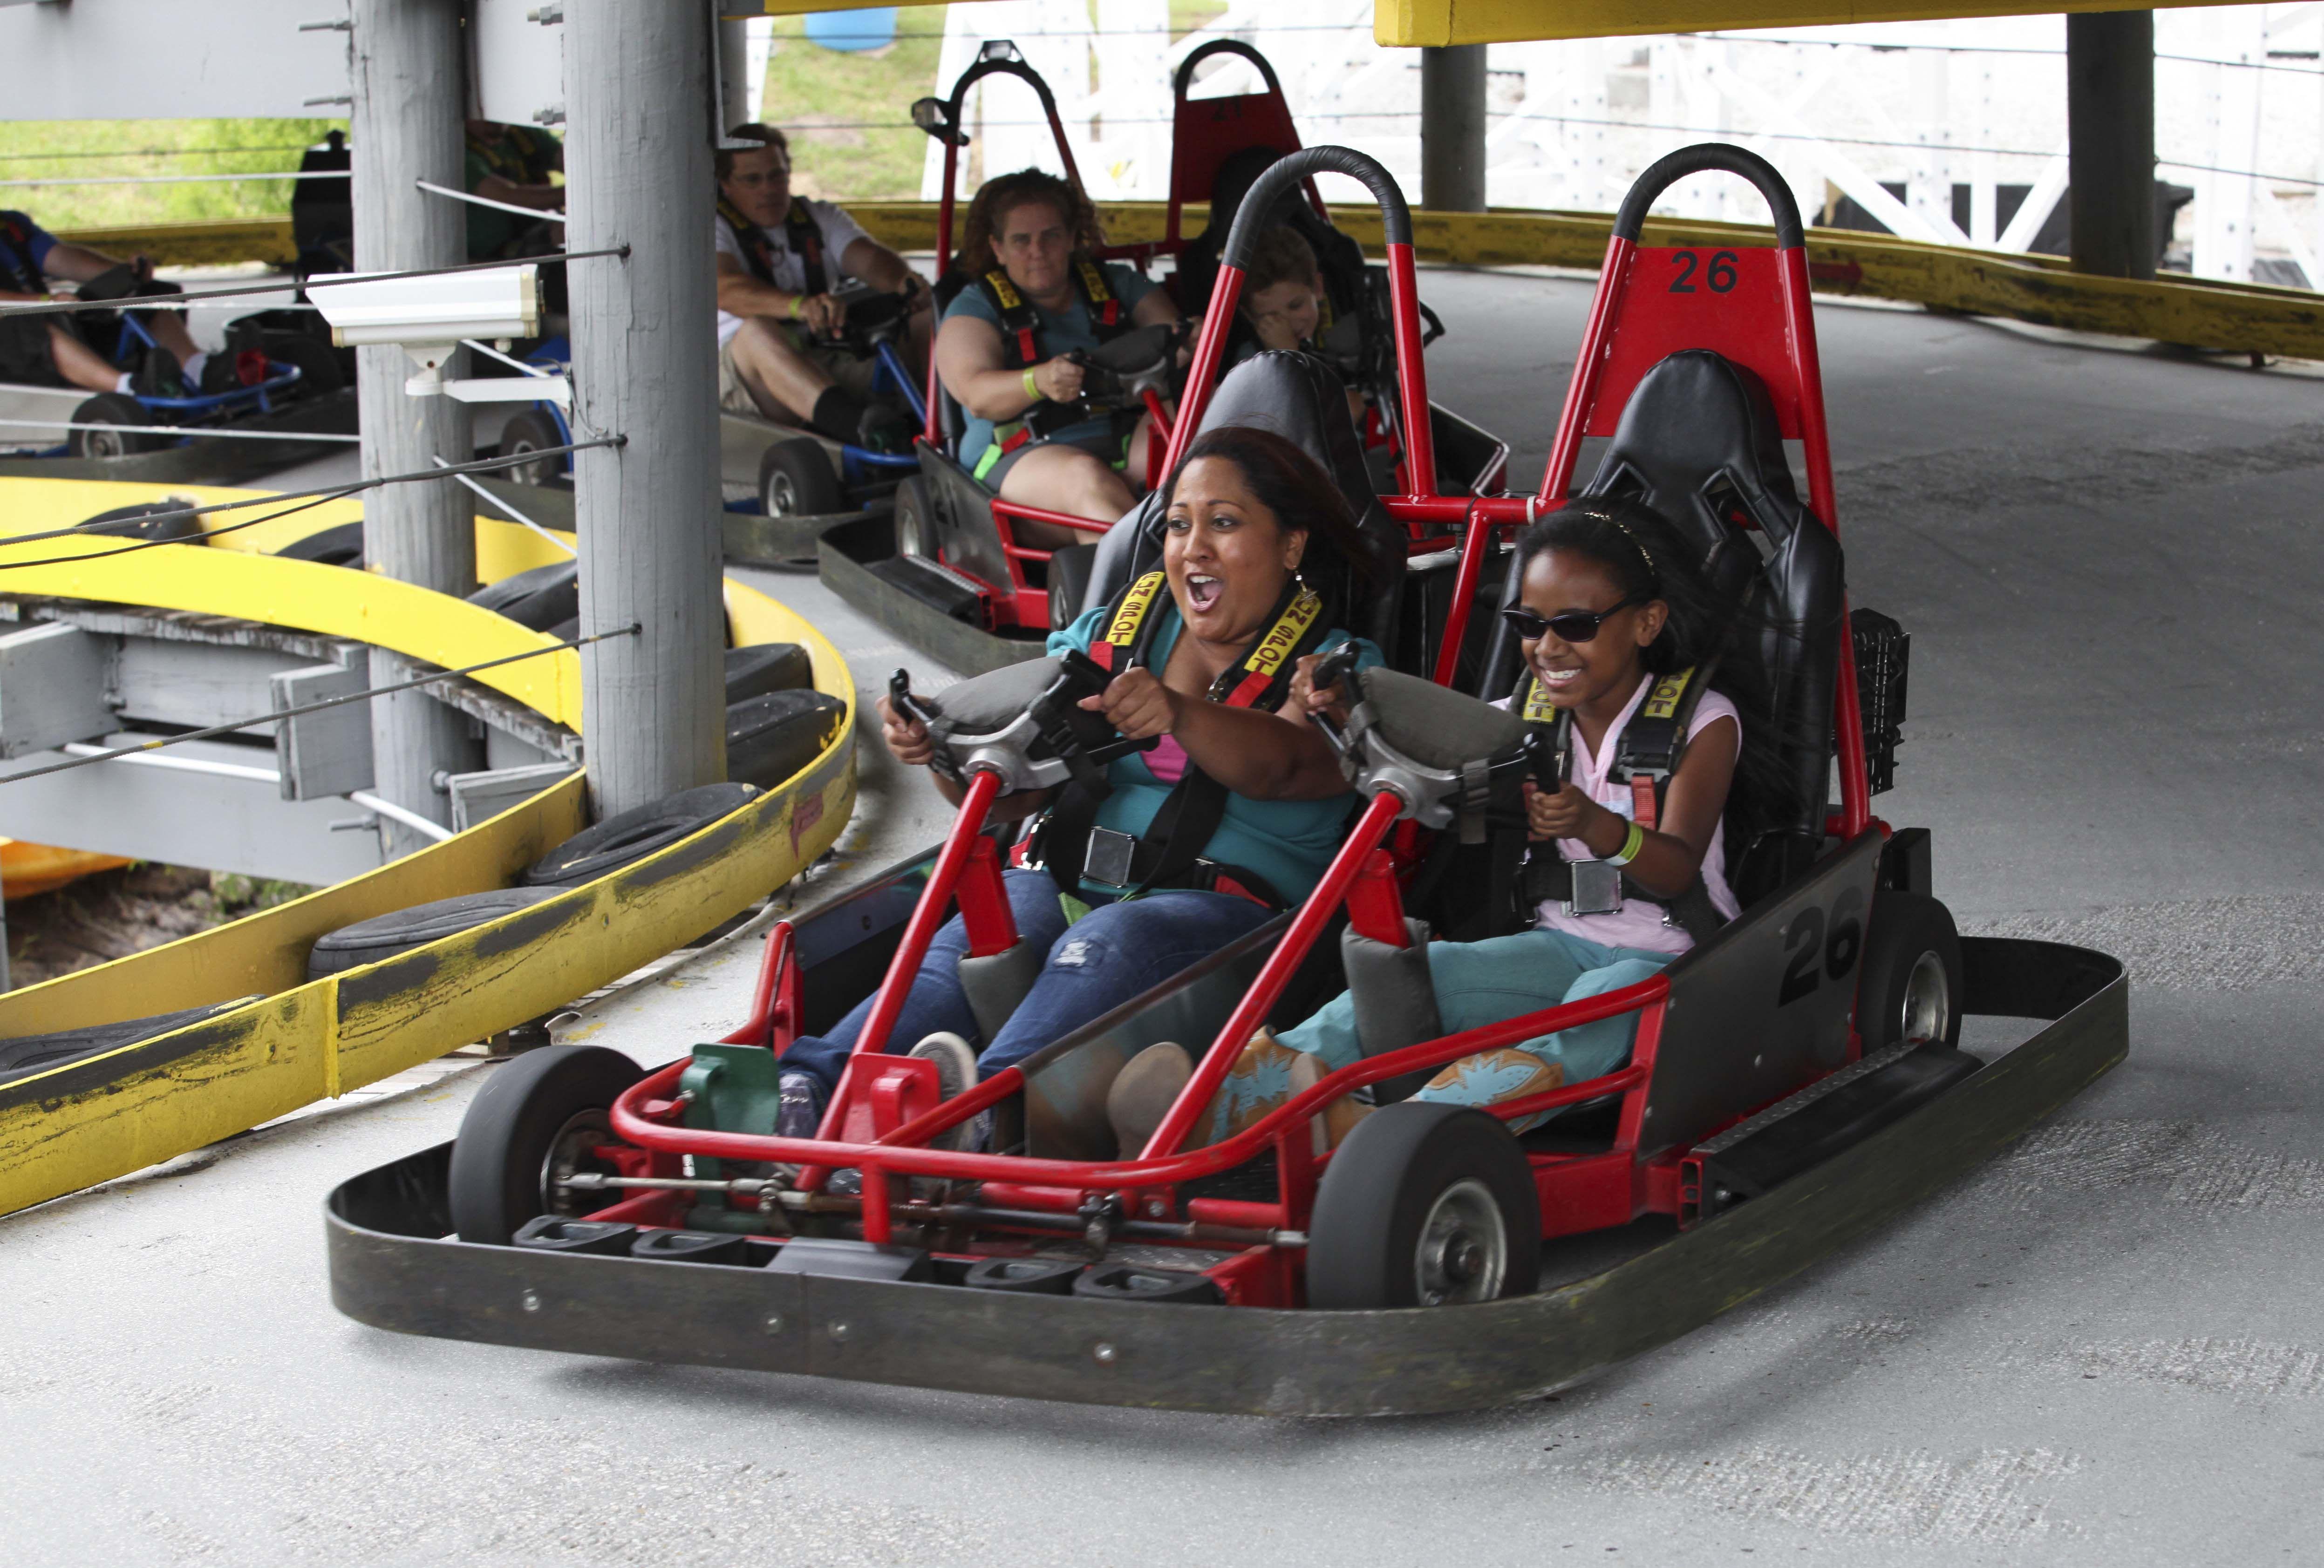 Go Karts Fun Spot